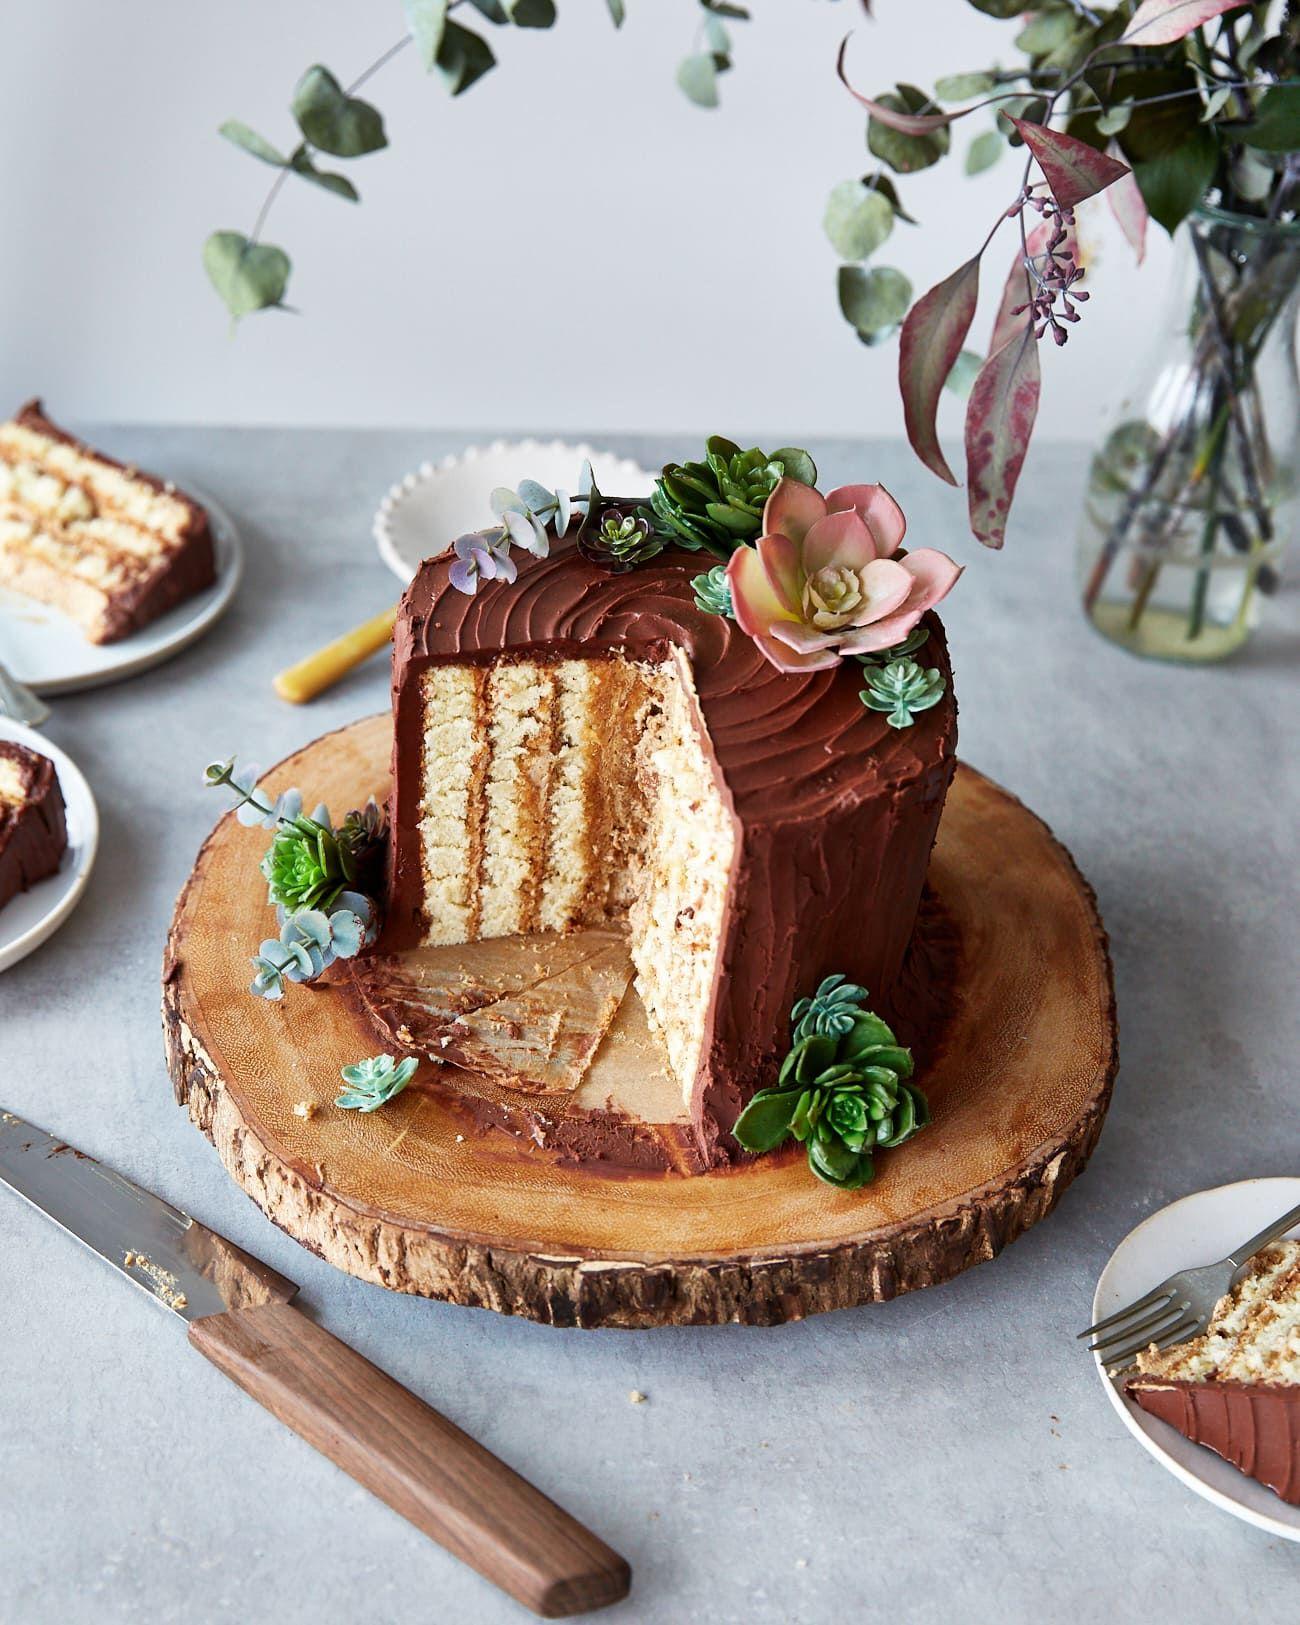 Tree Stump Cake Vertical Layer Chocolate Coffee Yule Log Izy Hossack Top With Cinnamon Recipe In 2020 Tree Stump Cake Yule Log Cake French Desserts Chocolate